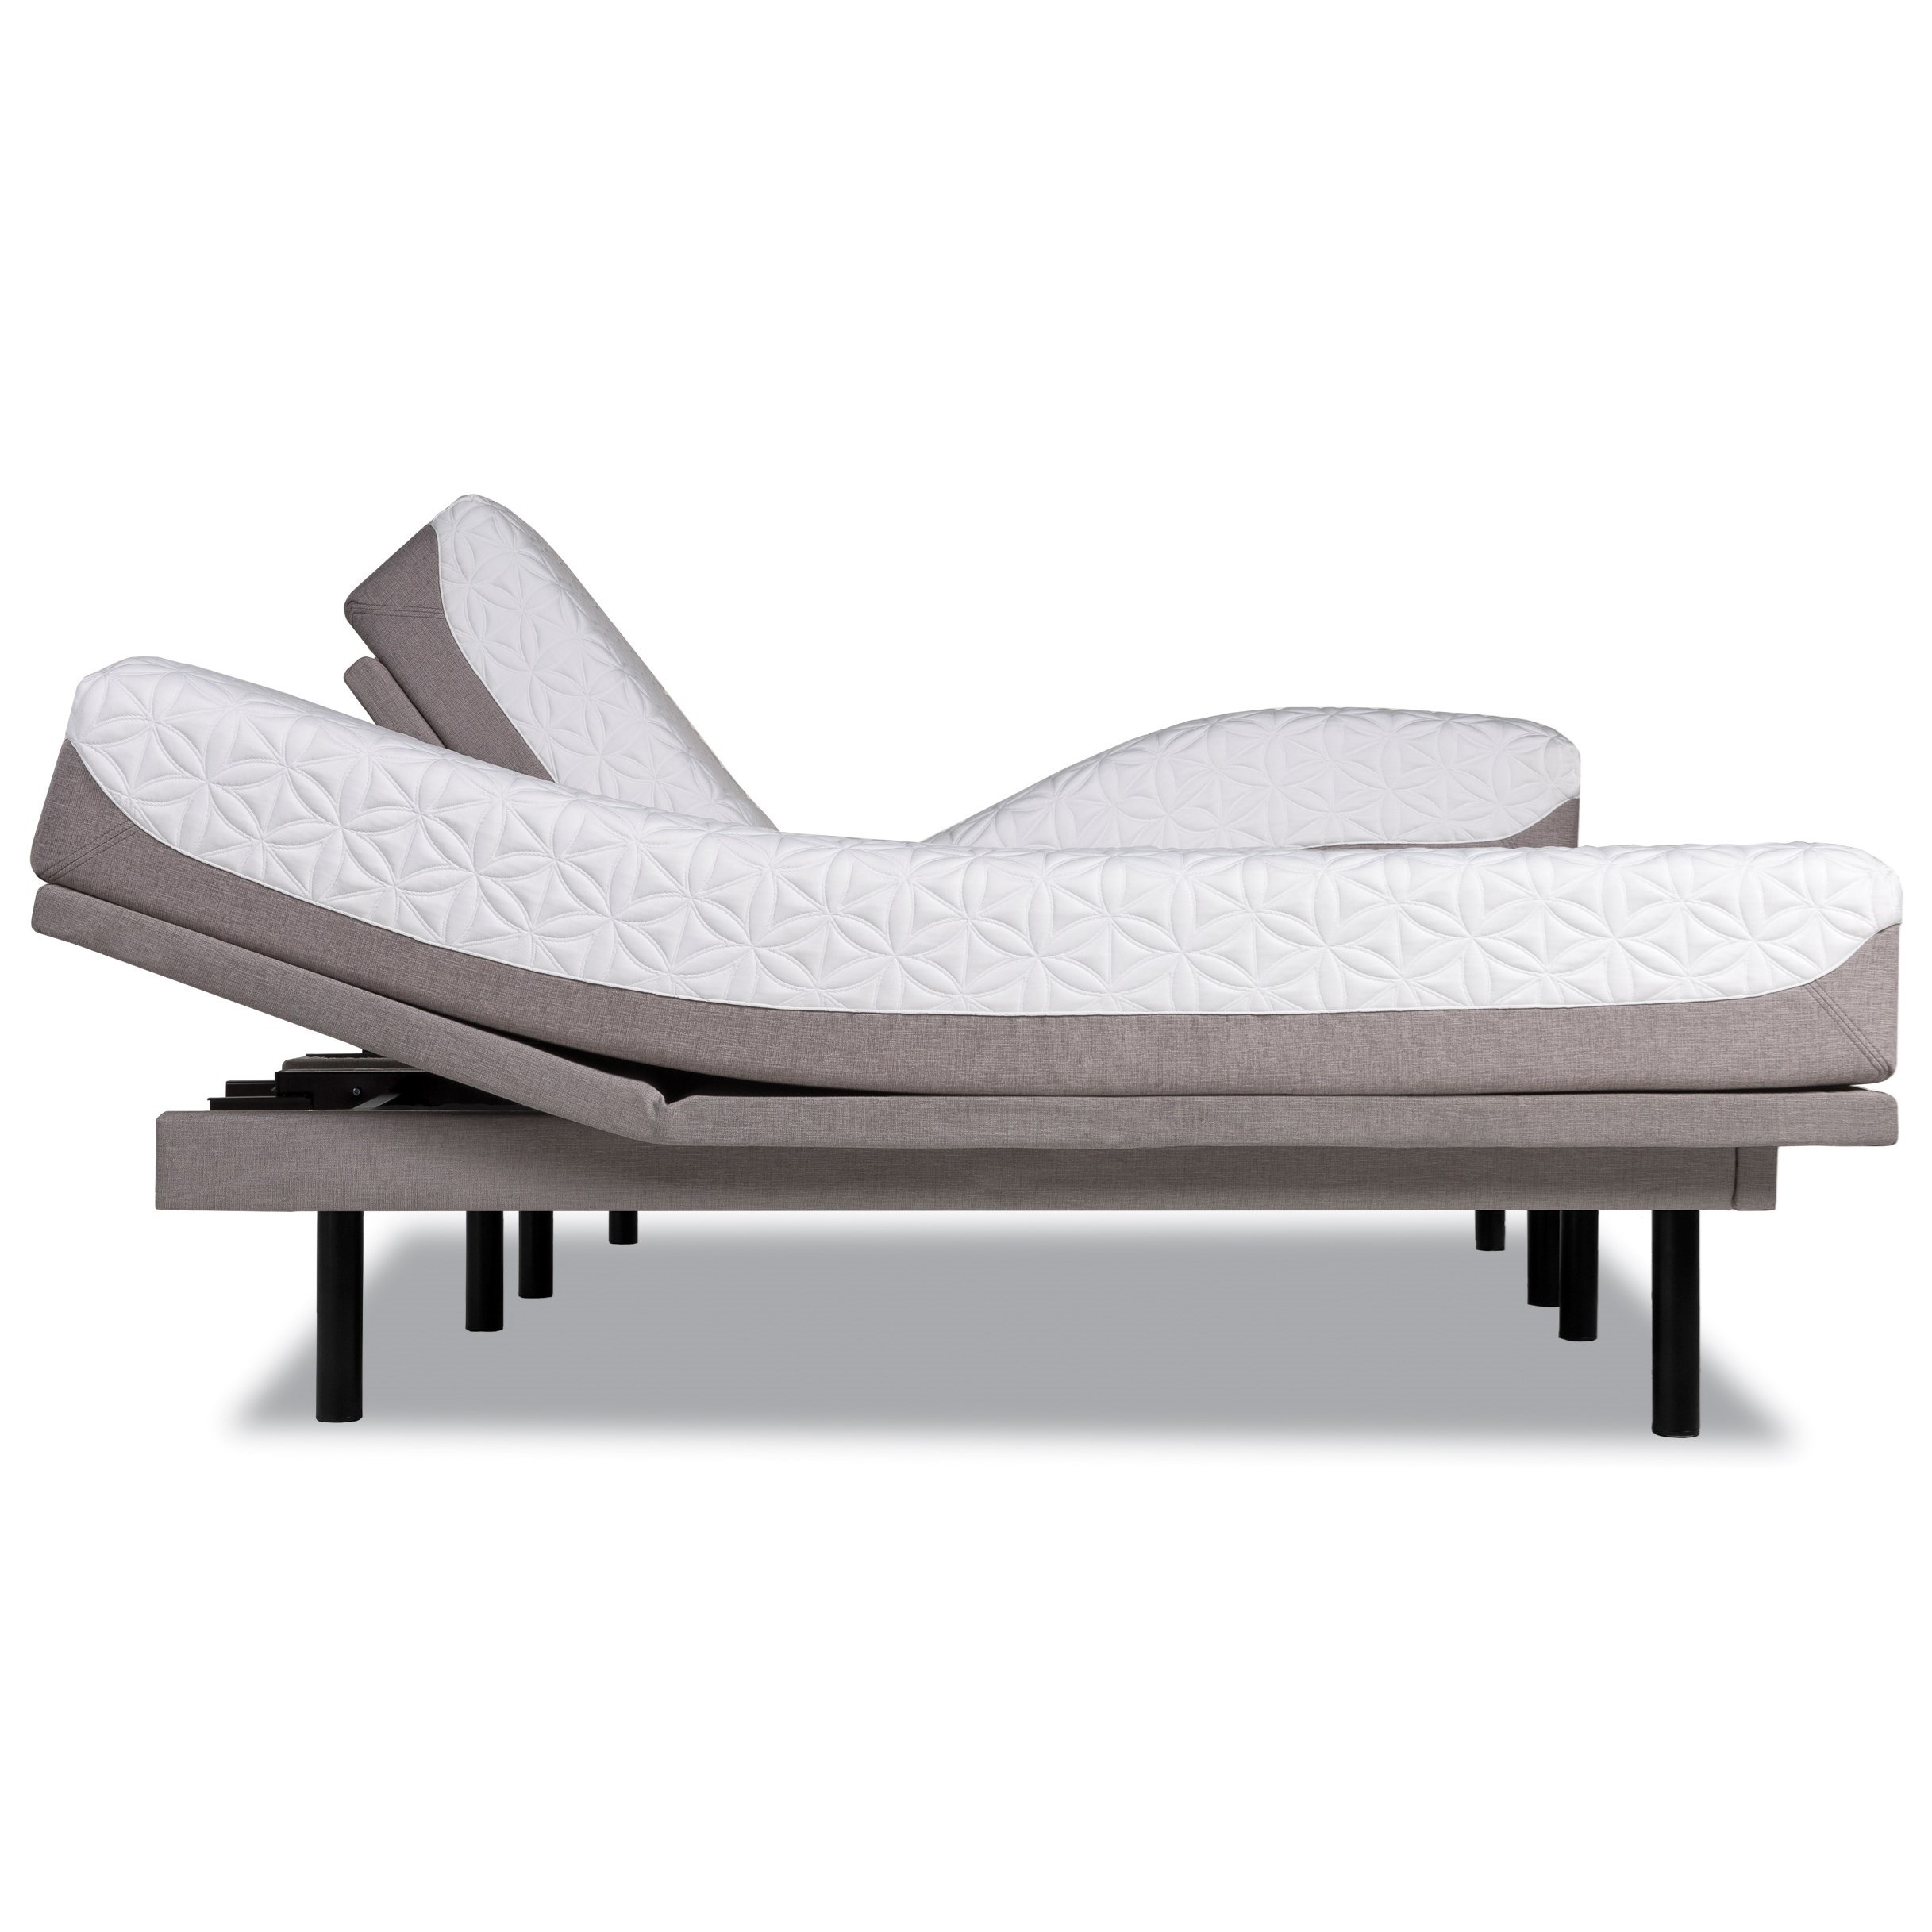 Tempur-Pedic® TEMPUR-Cloud Prima King Medium-Soft Mattress Set - Item Number: 10237170+2x25289220